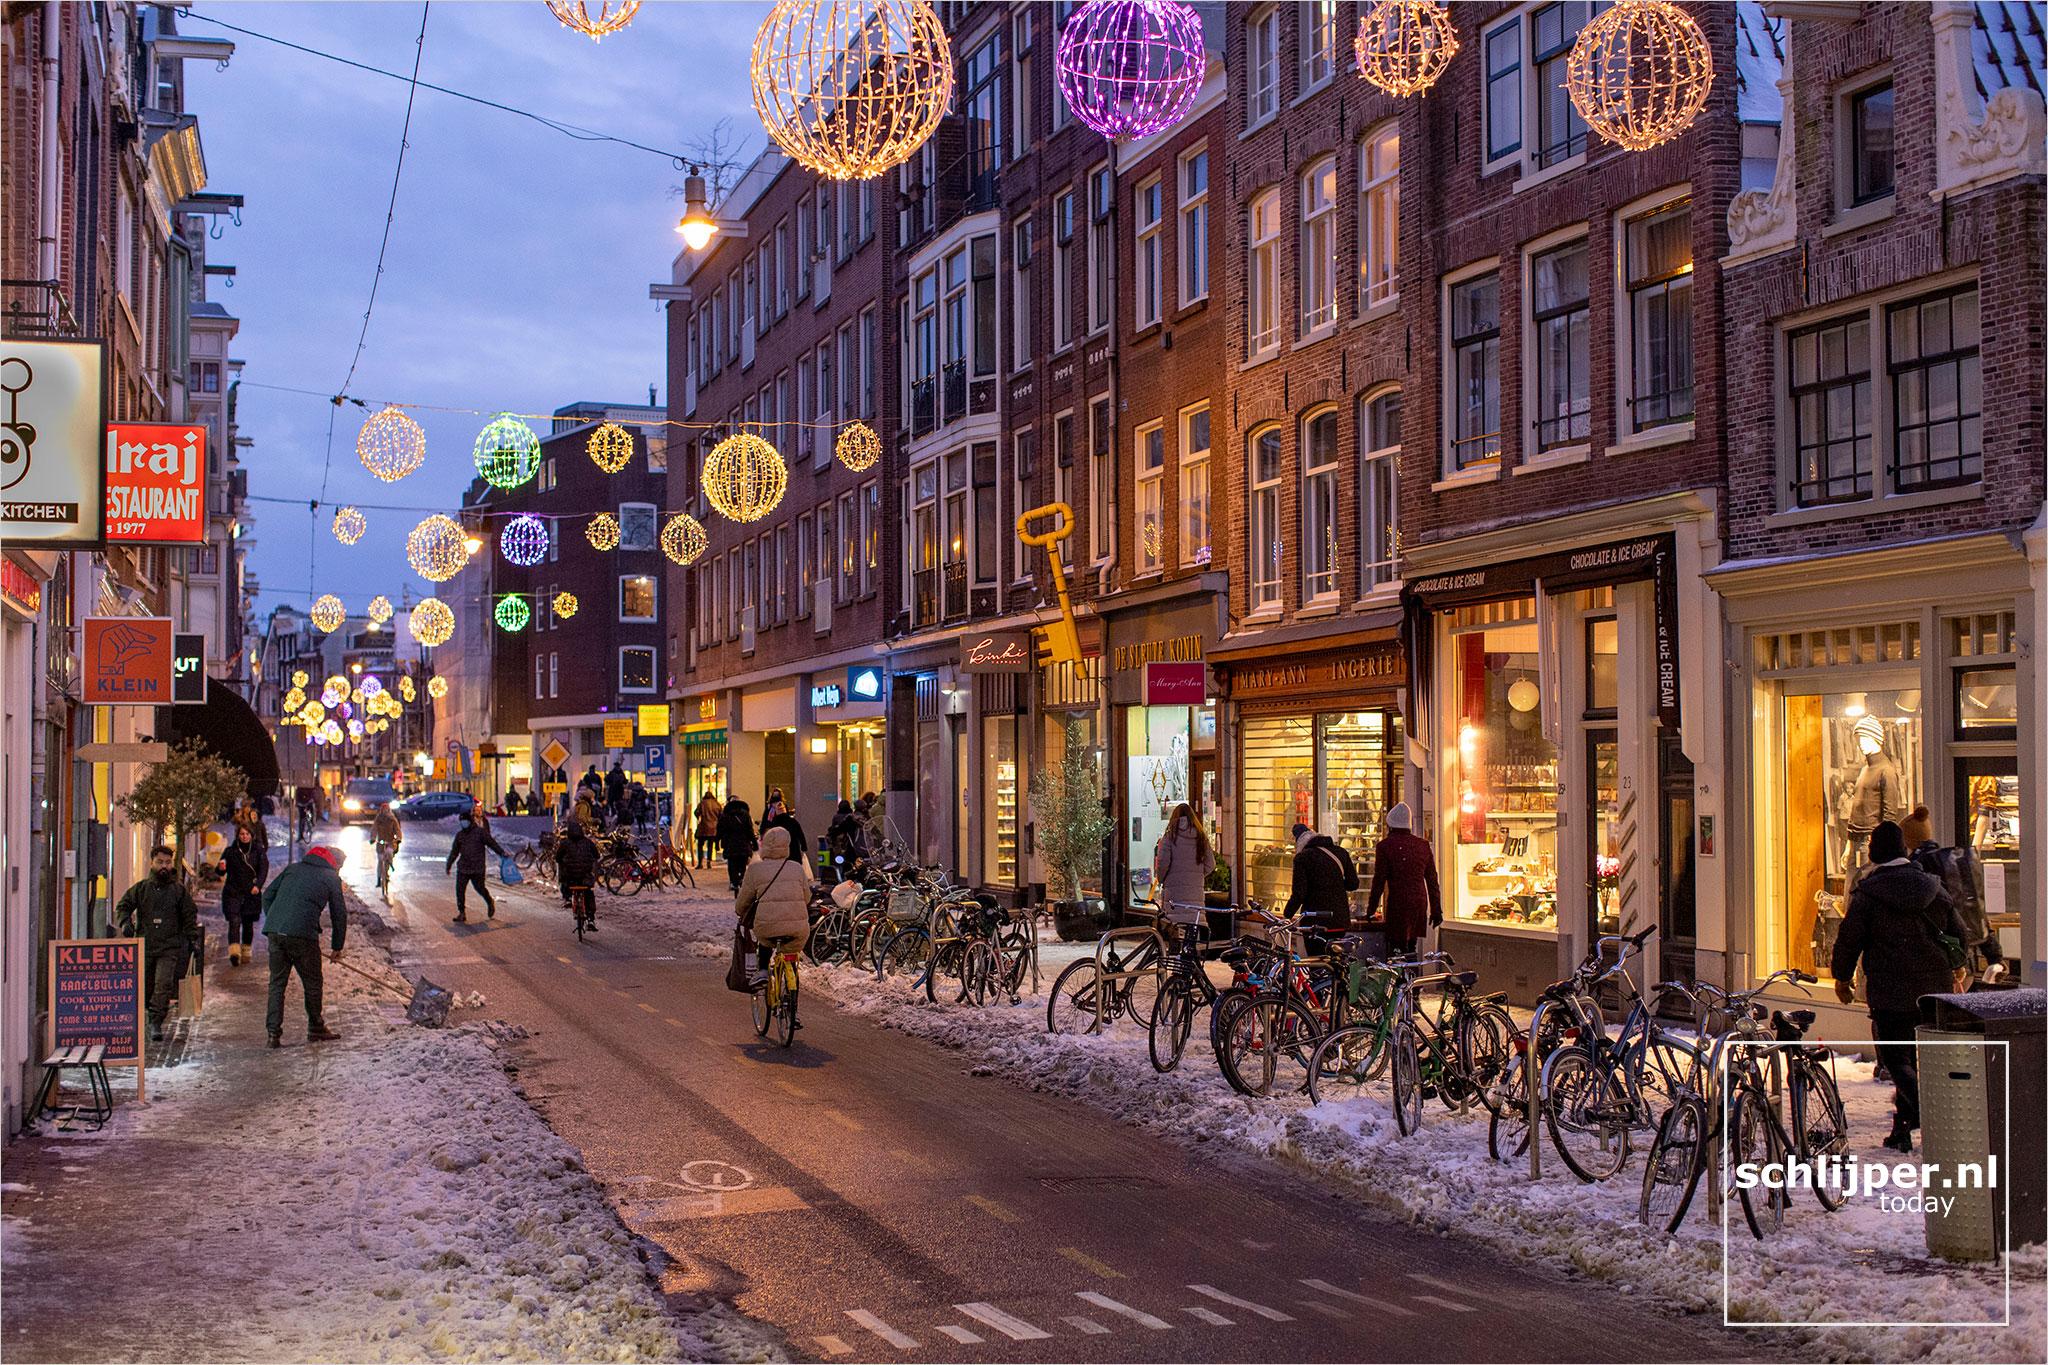 The Netherlands, Amsterdam, 10 februari 2021